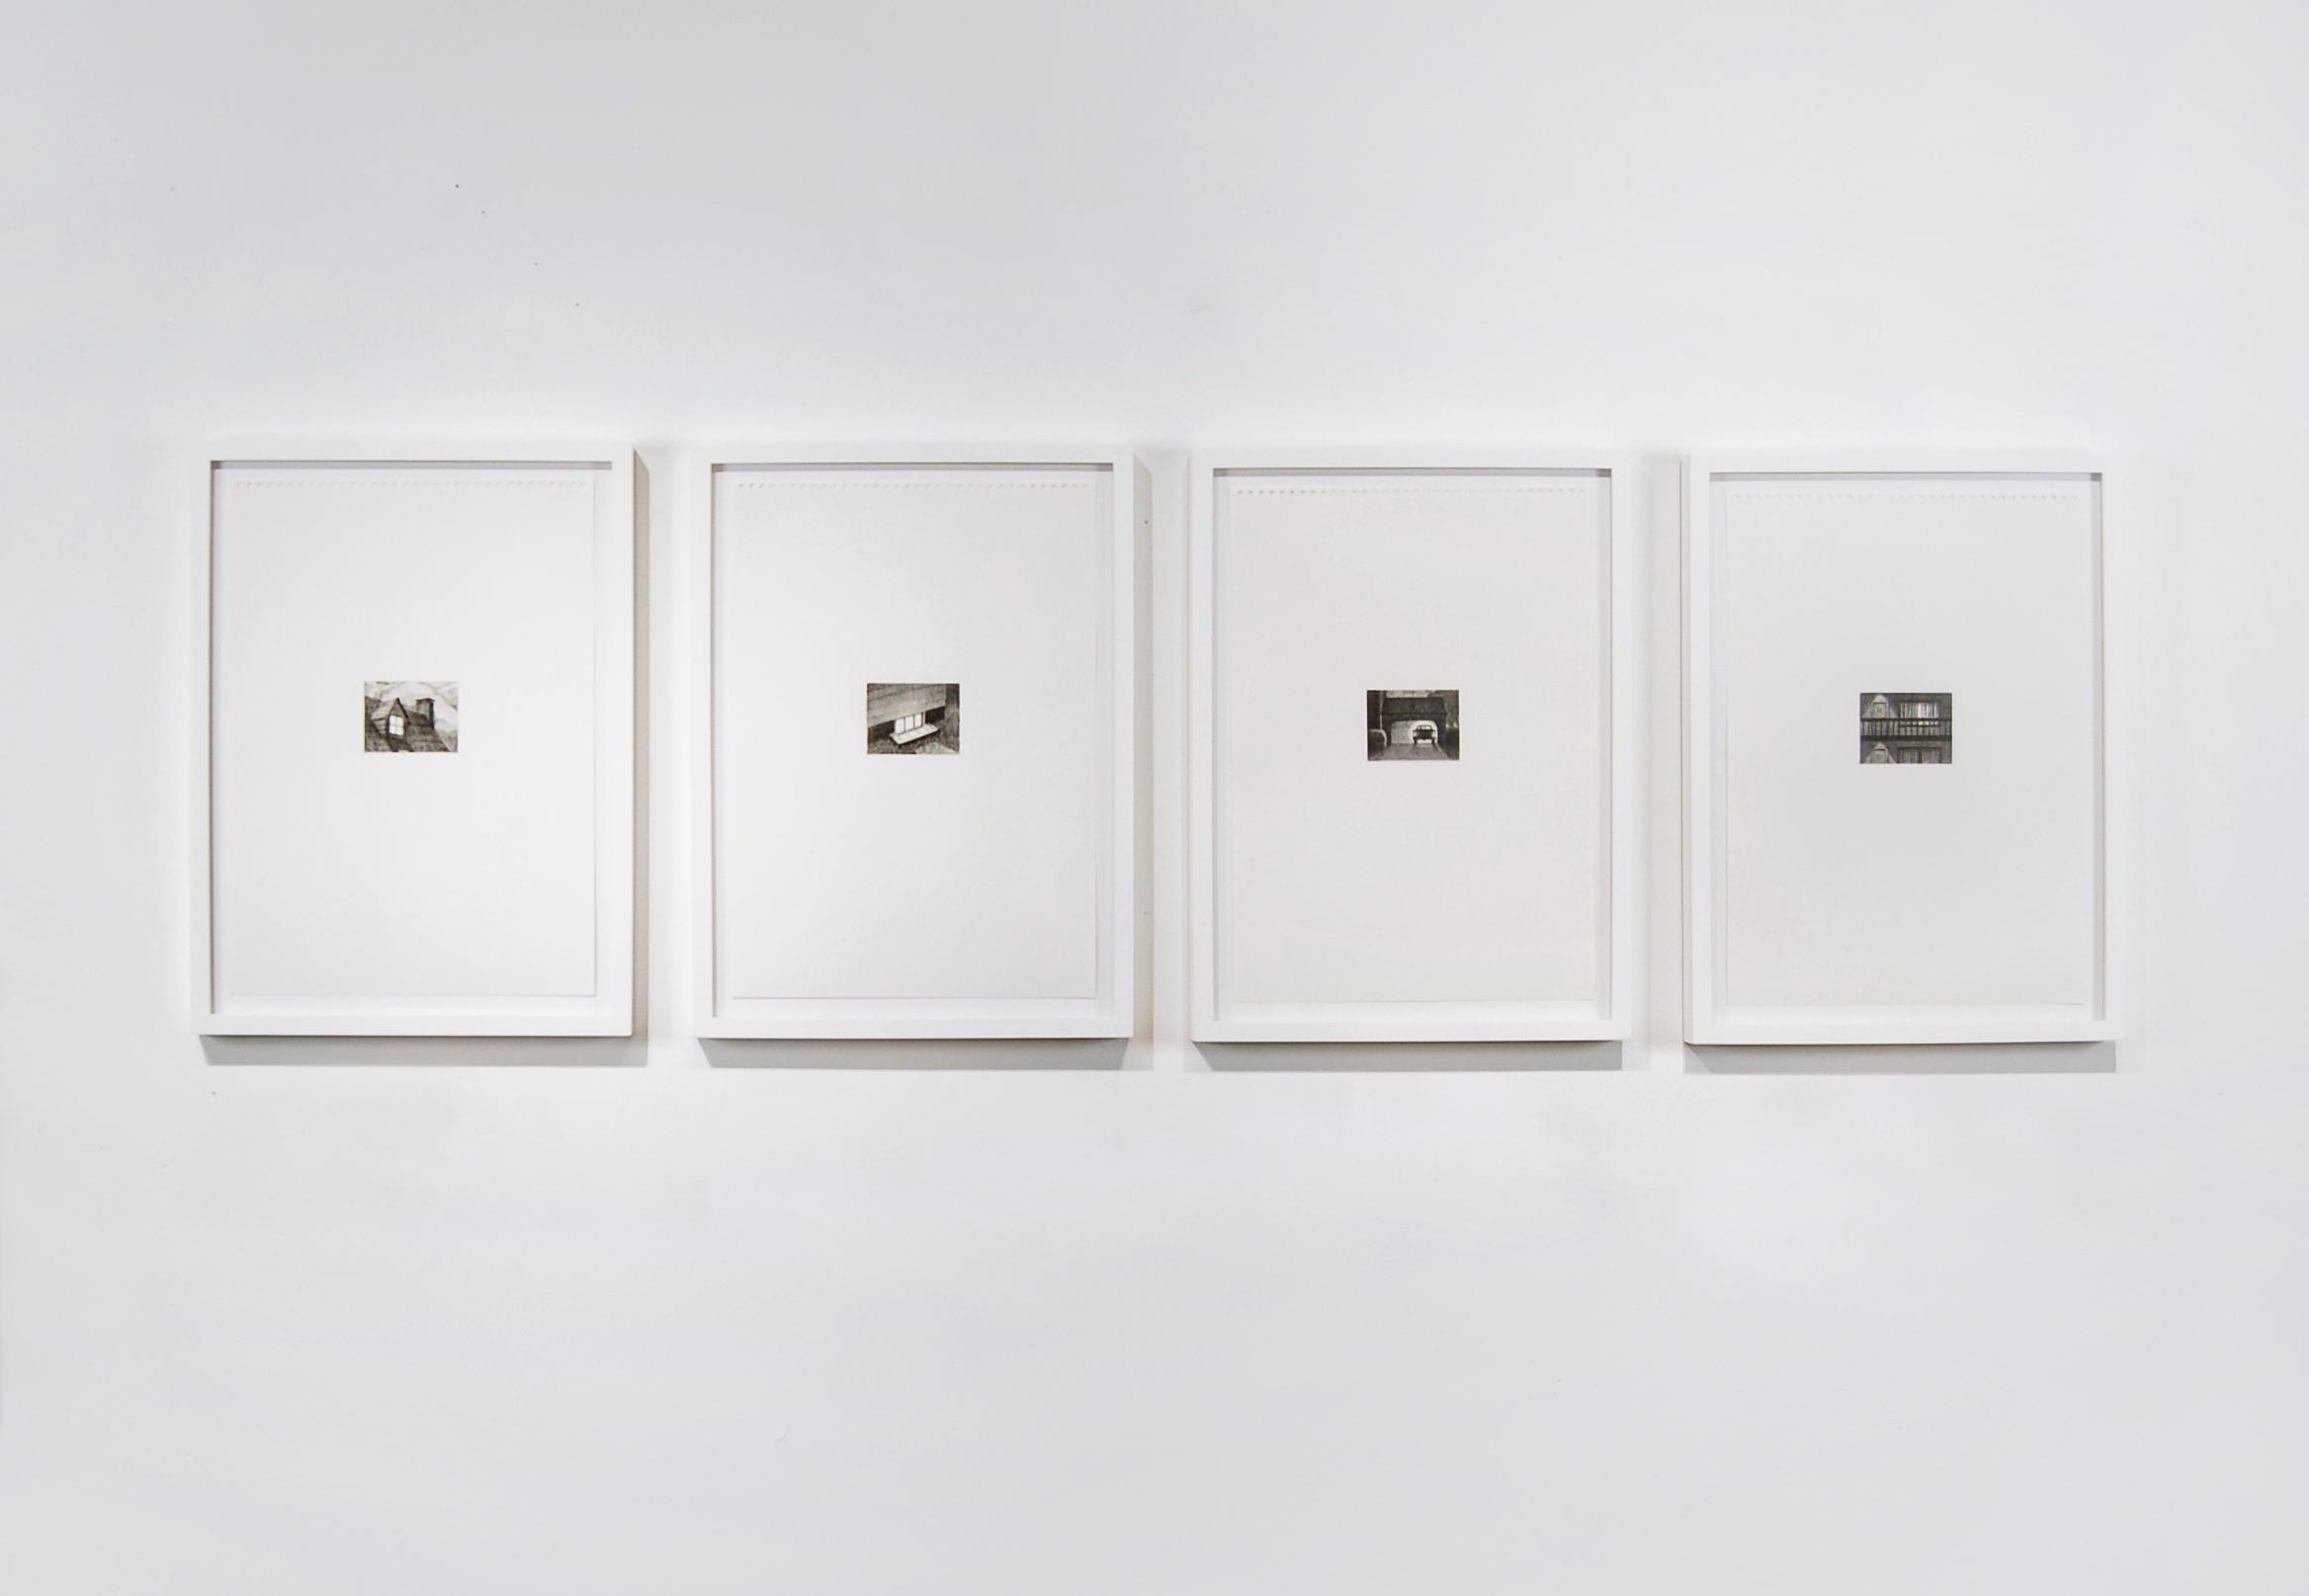 "Secrets,  2013/2014, 2.5"" x 3"" (image), 11.5"" x 16"" (paper), Graphite on Paper"